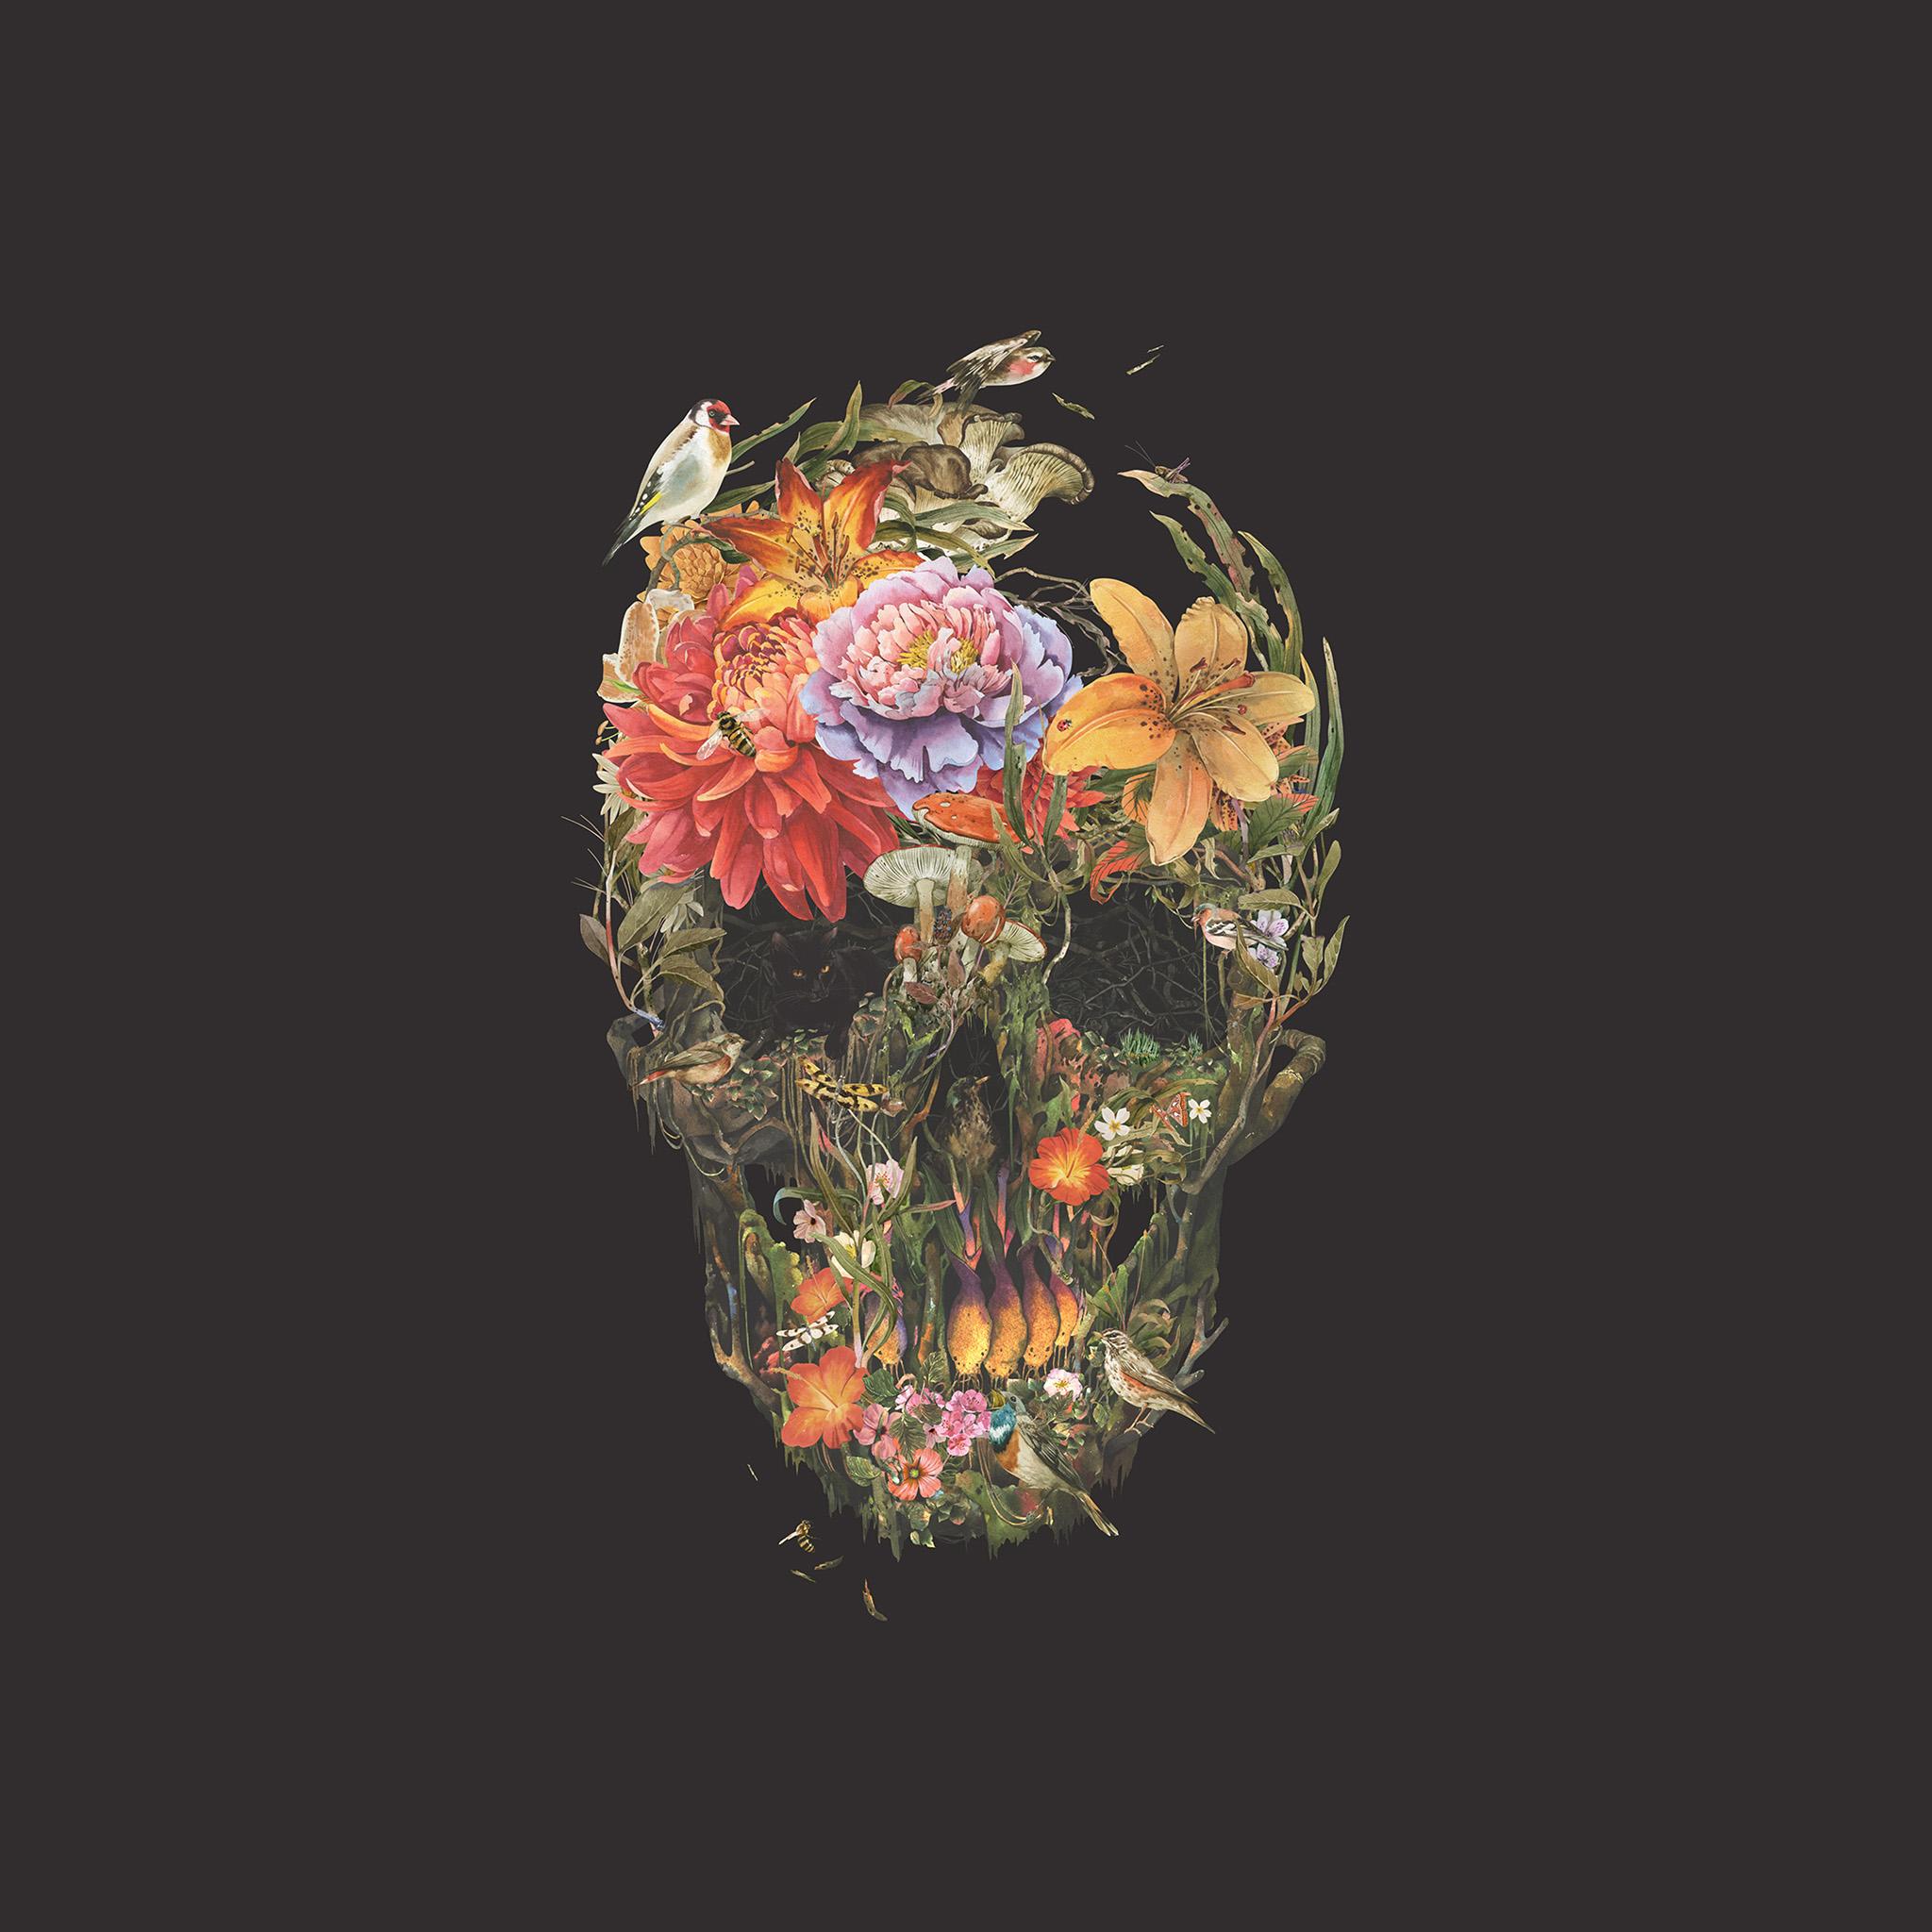 bf04-skull-flower-dark-painting-art-wallpaper